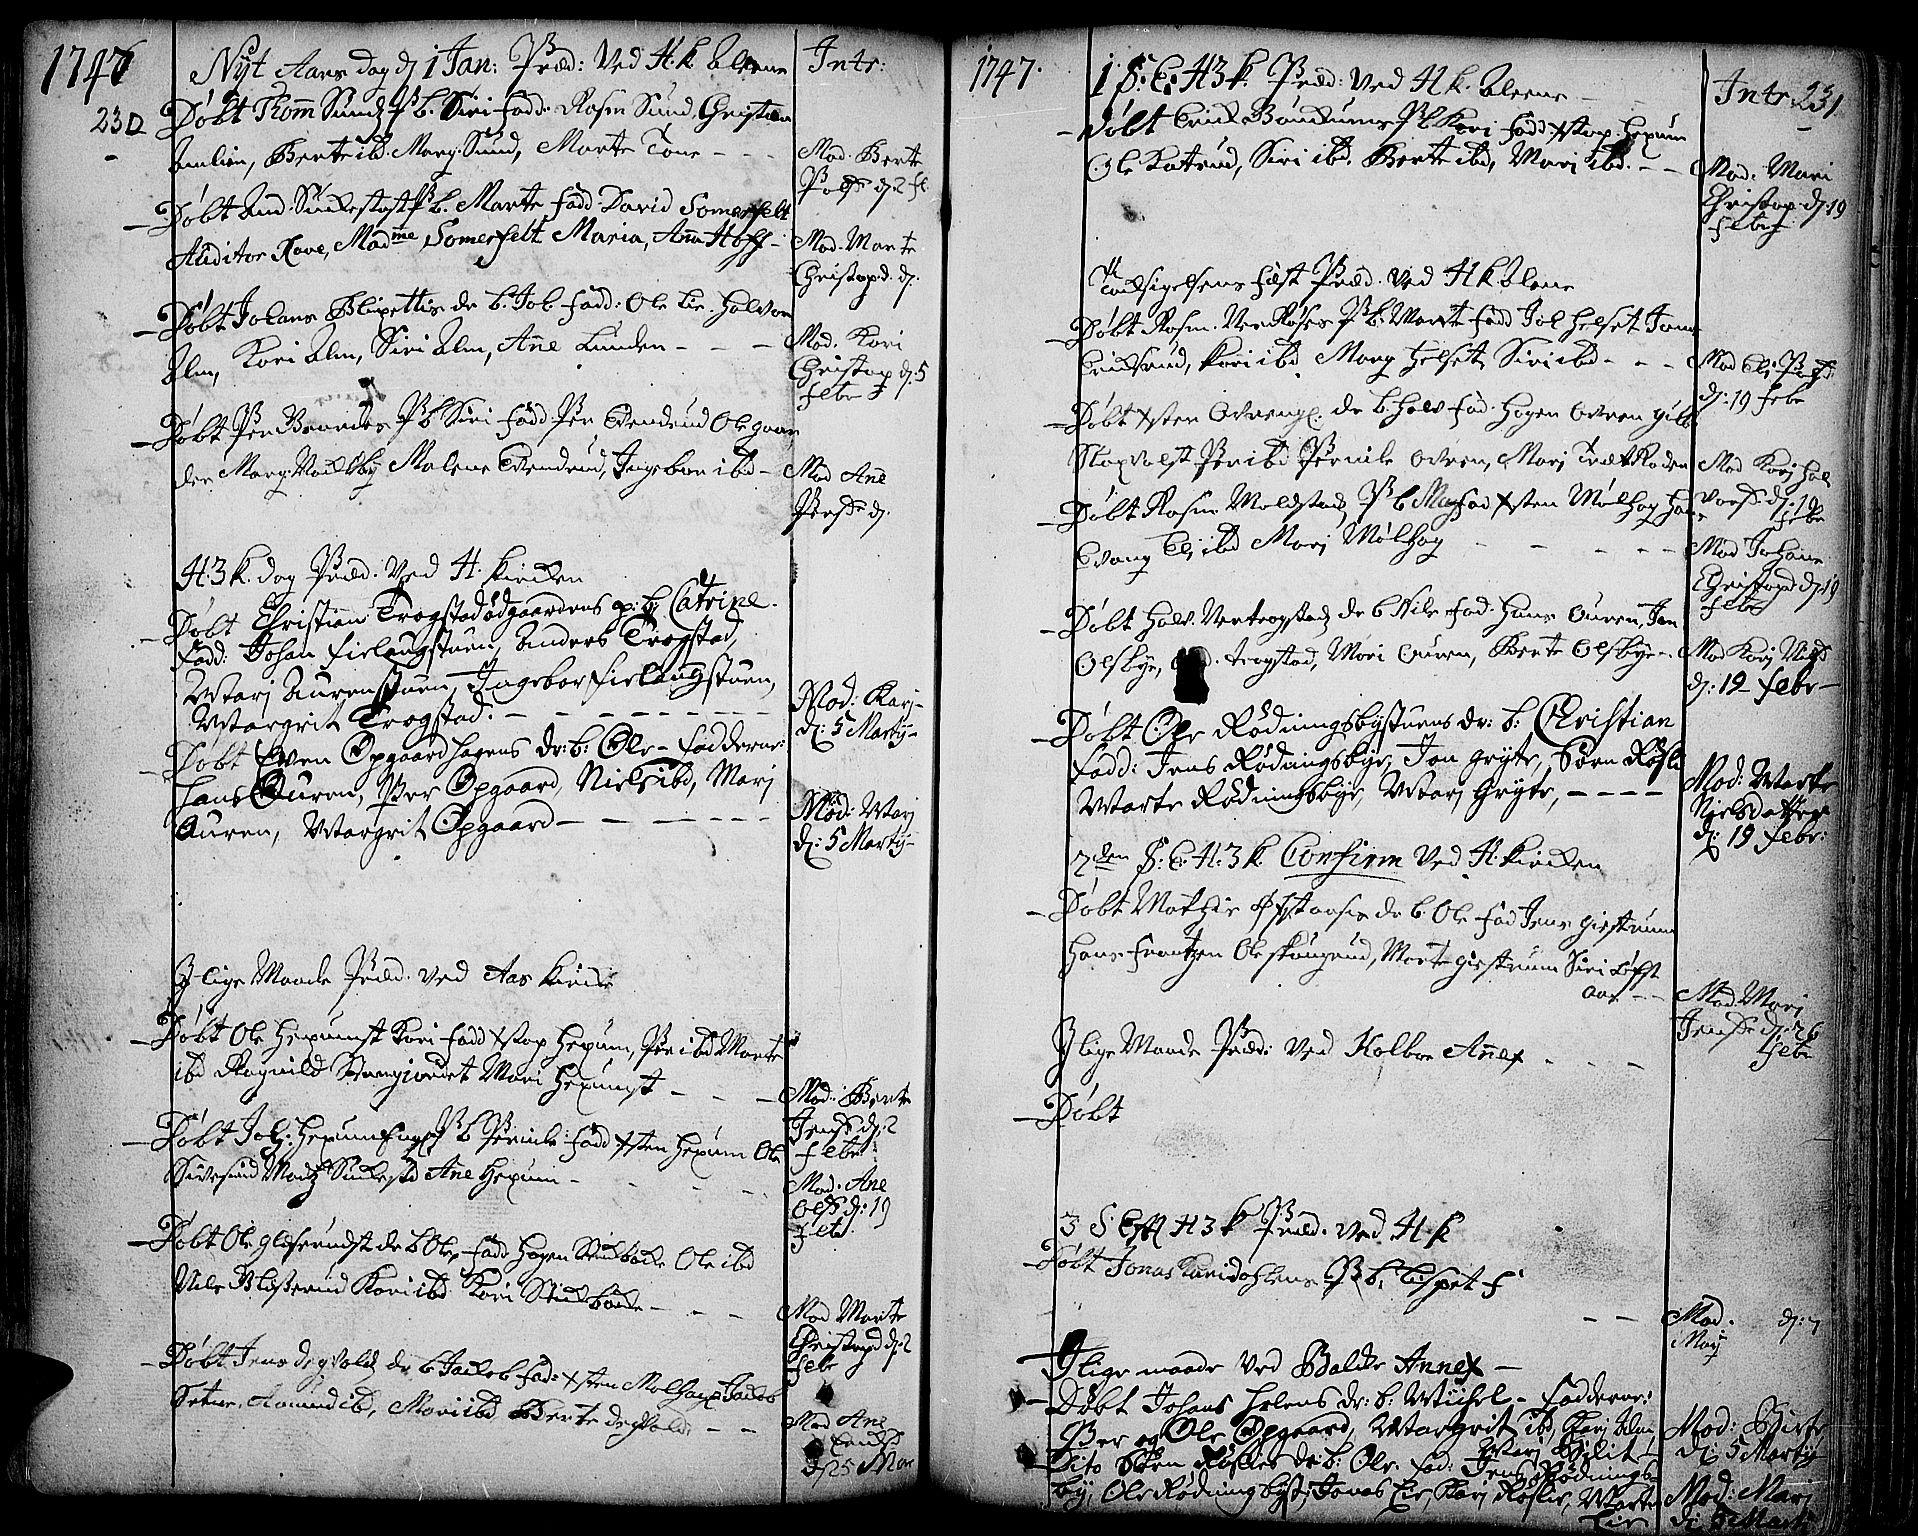 SAH, Toten prestekontor, Ministerialbok nr. 3, 1734-1751, s. 230-231